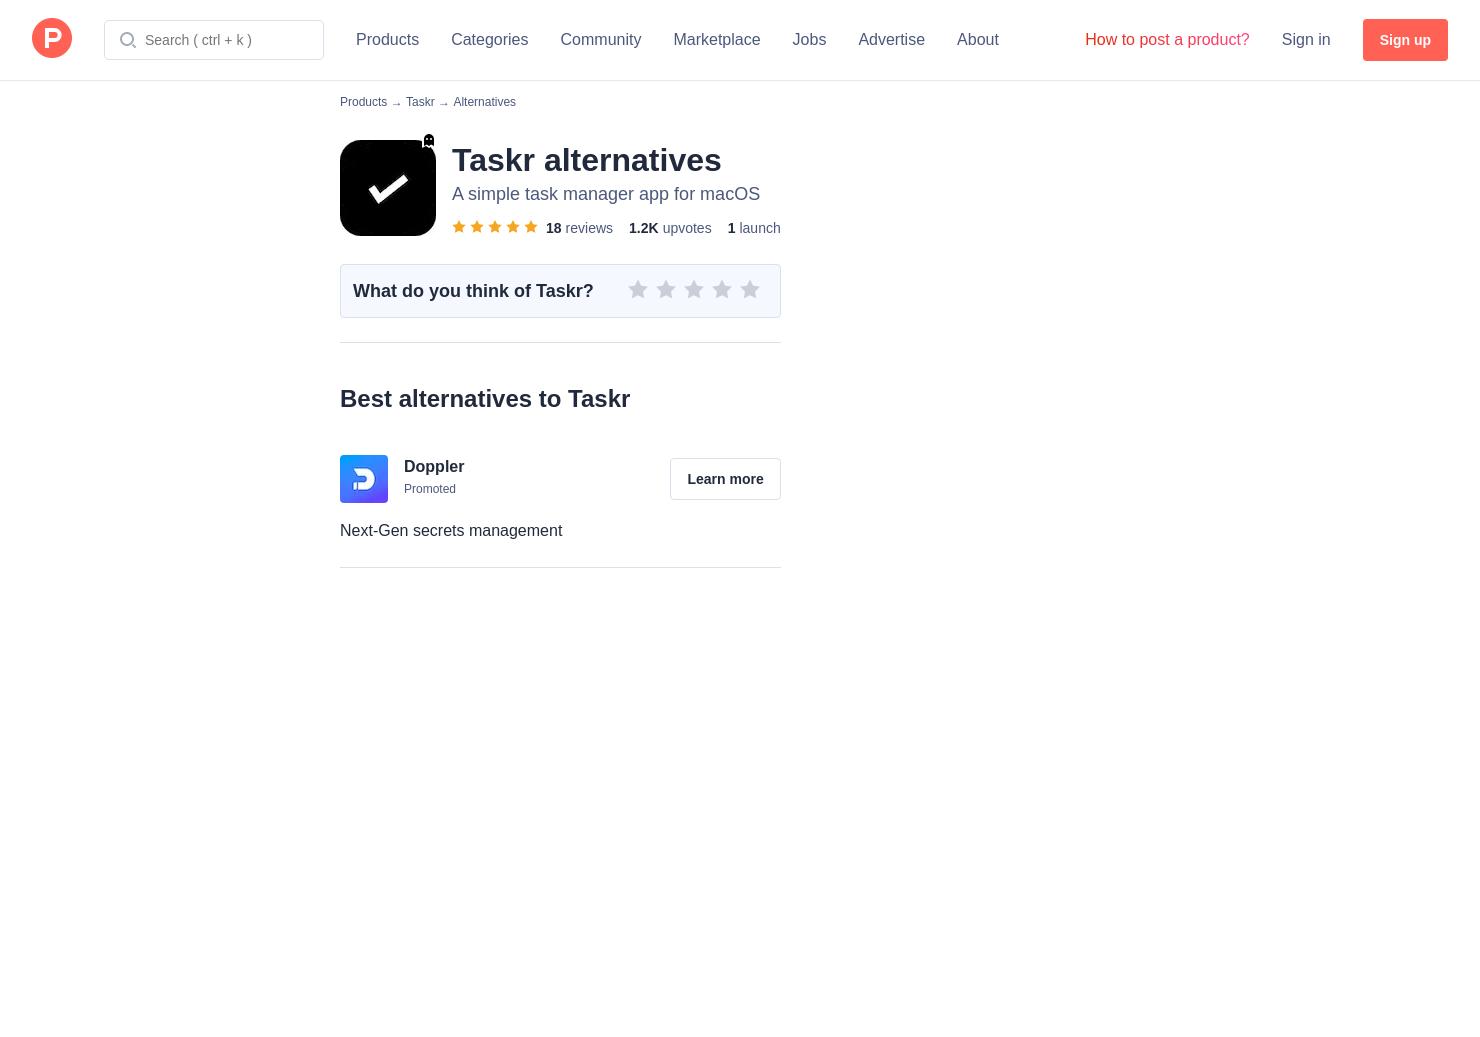 23 Alternatives to Taskr for Mac | Product Hunt